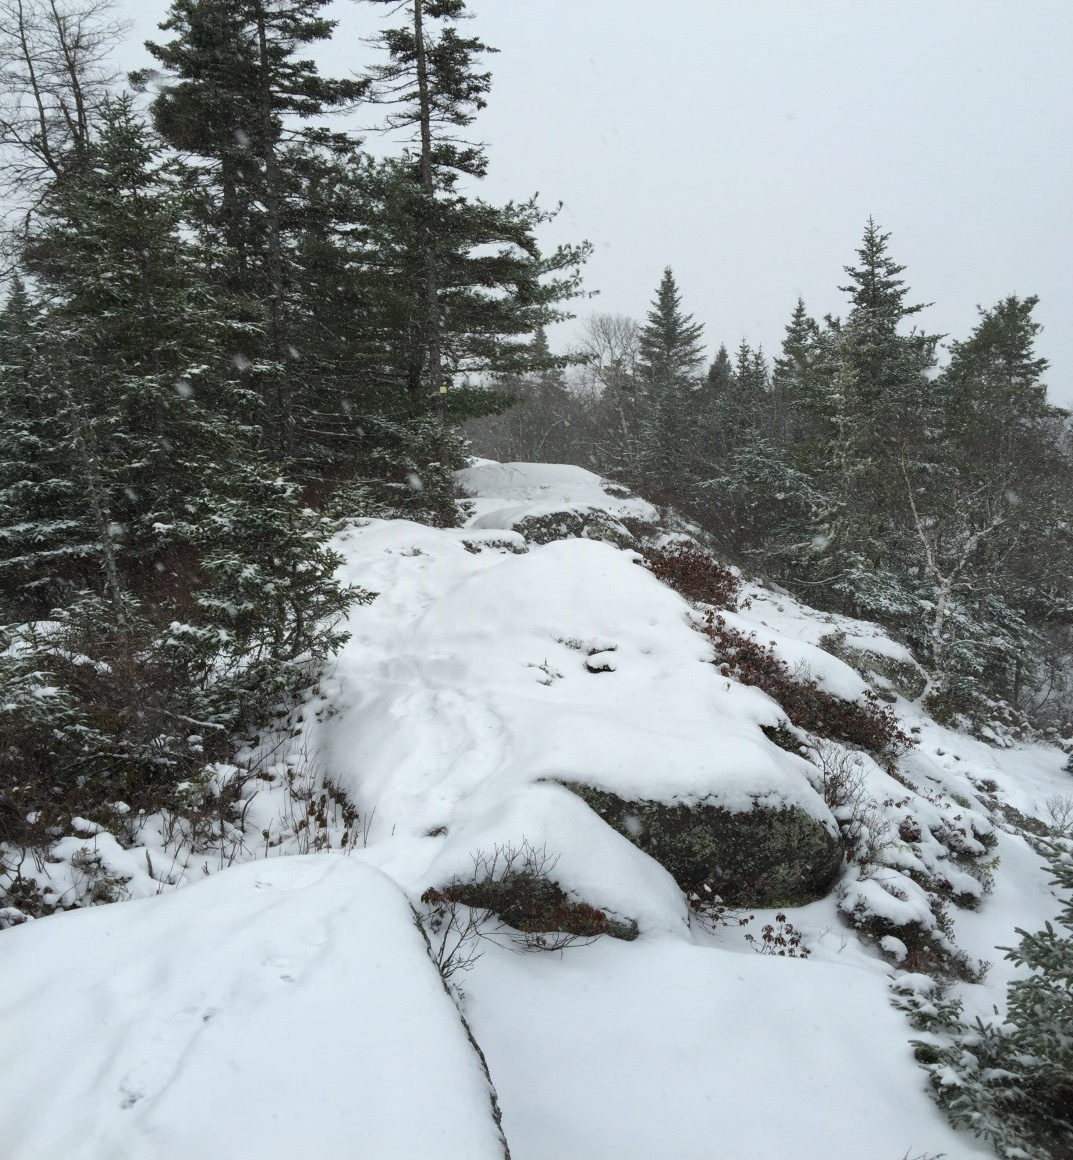 A snowy ride along a Halifax ridge in late January